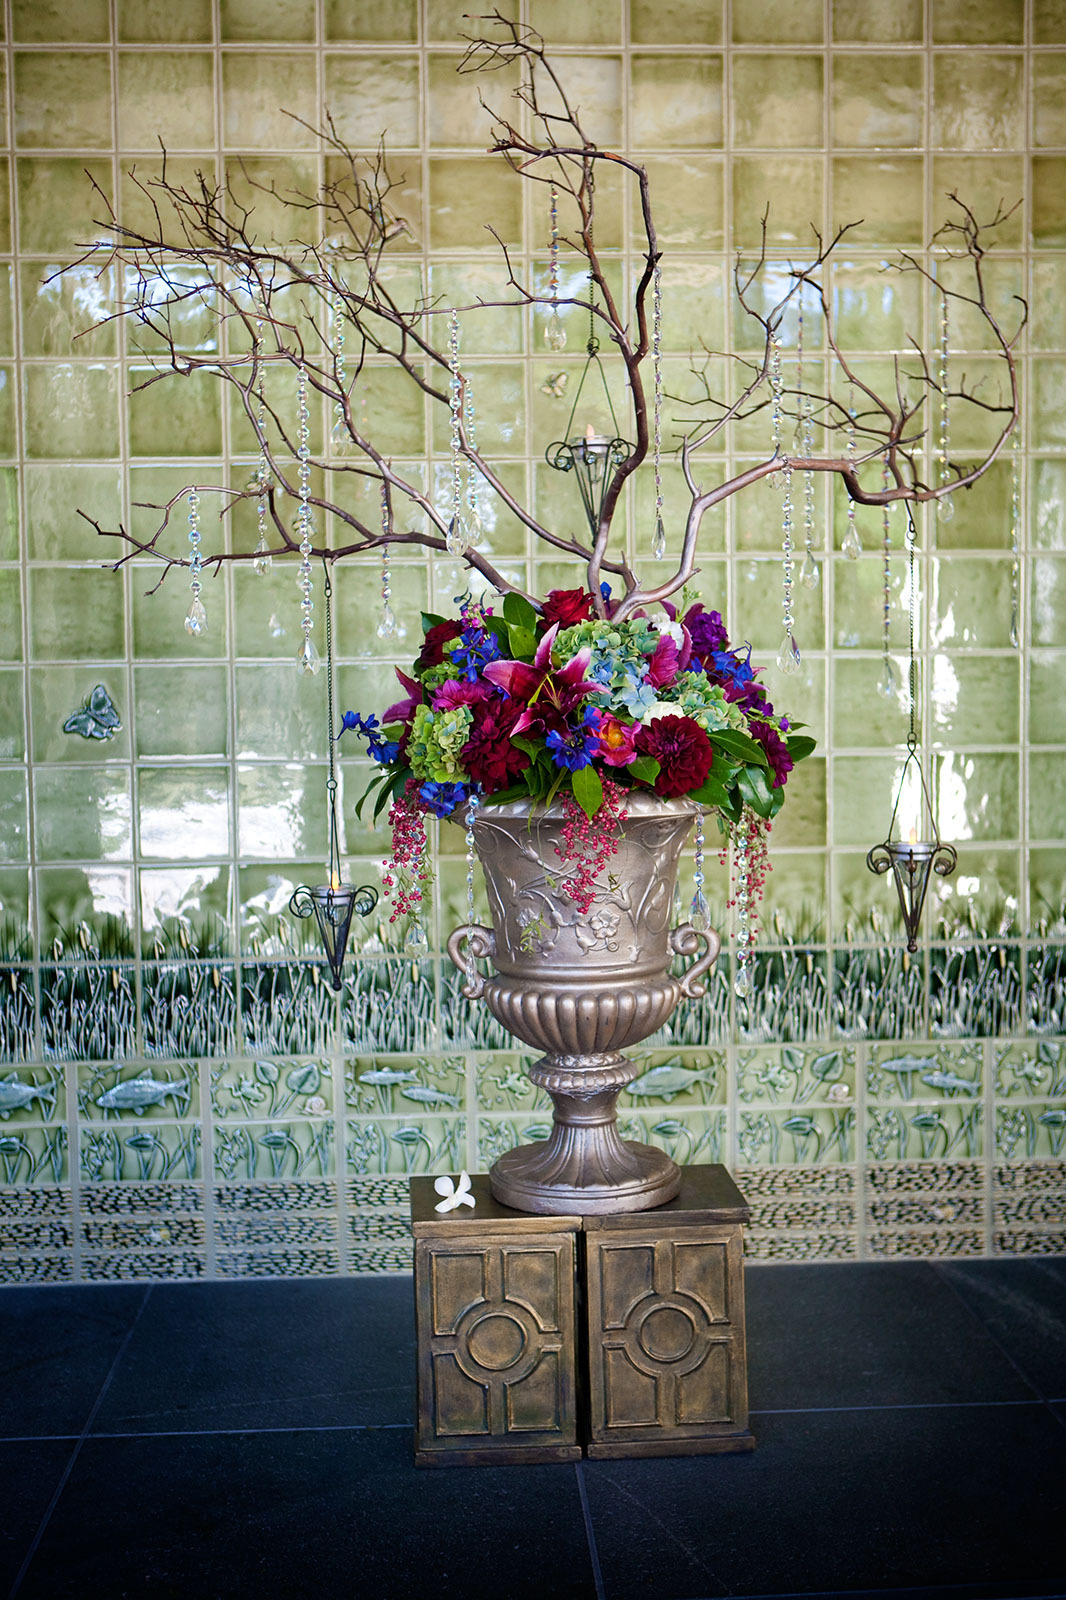 Roses, Centerpiece, Orchids, Tree, Tea, Hydrangea, Lights, Victorias florals, Dahilas